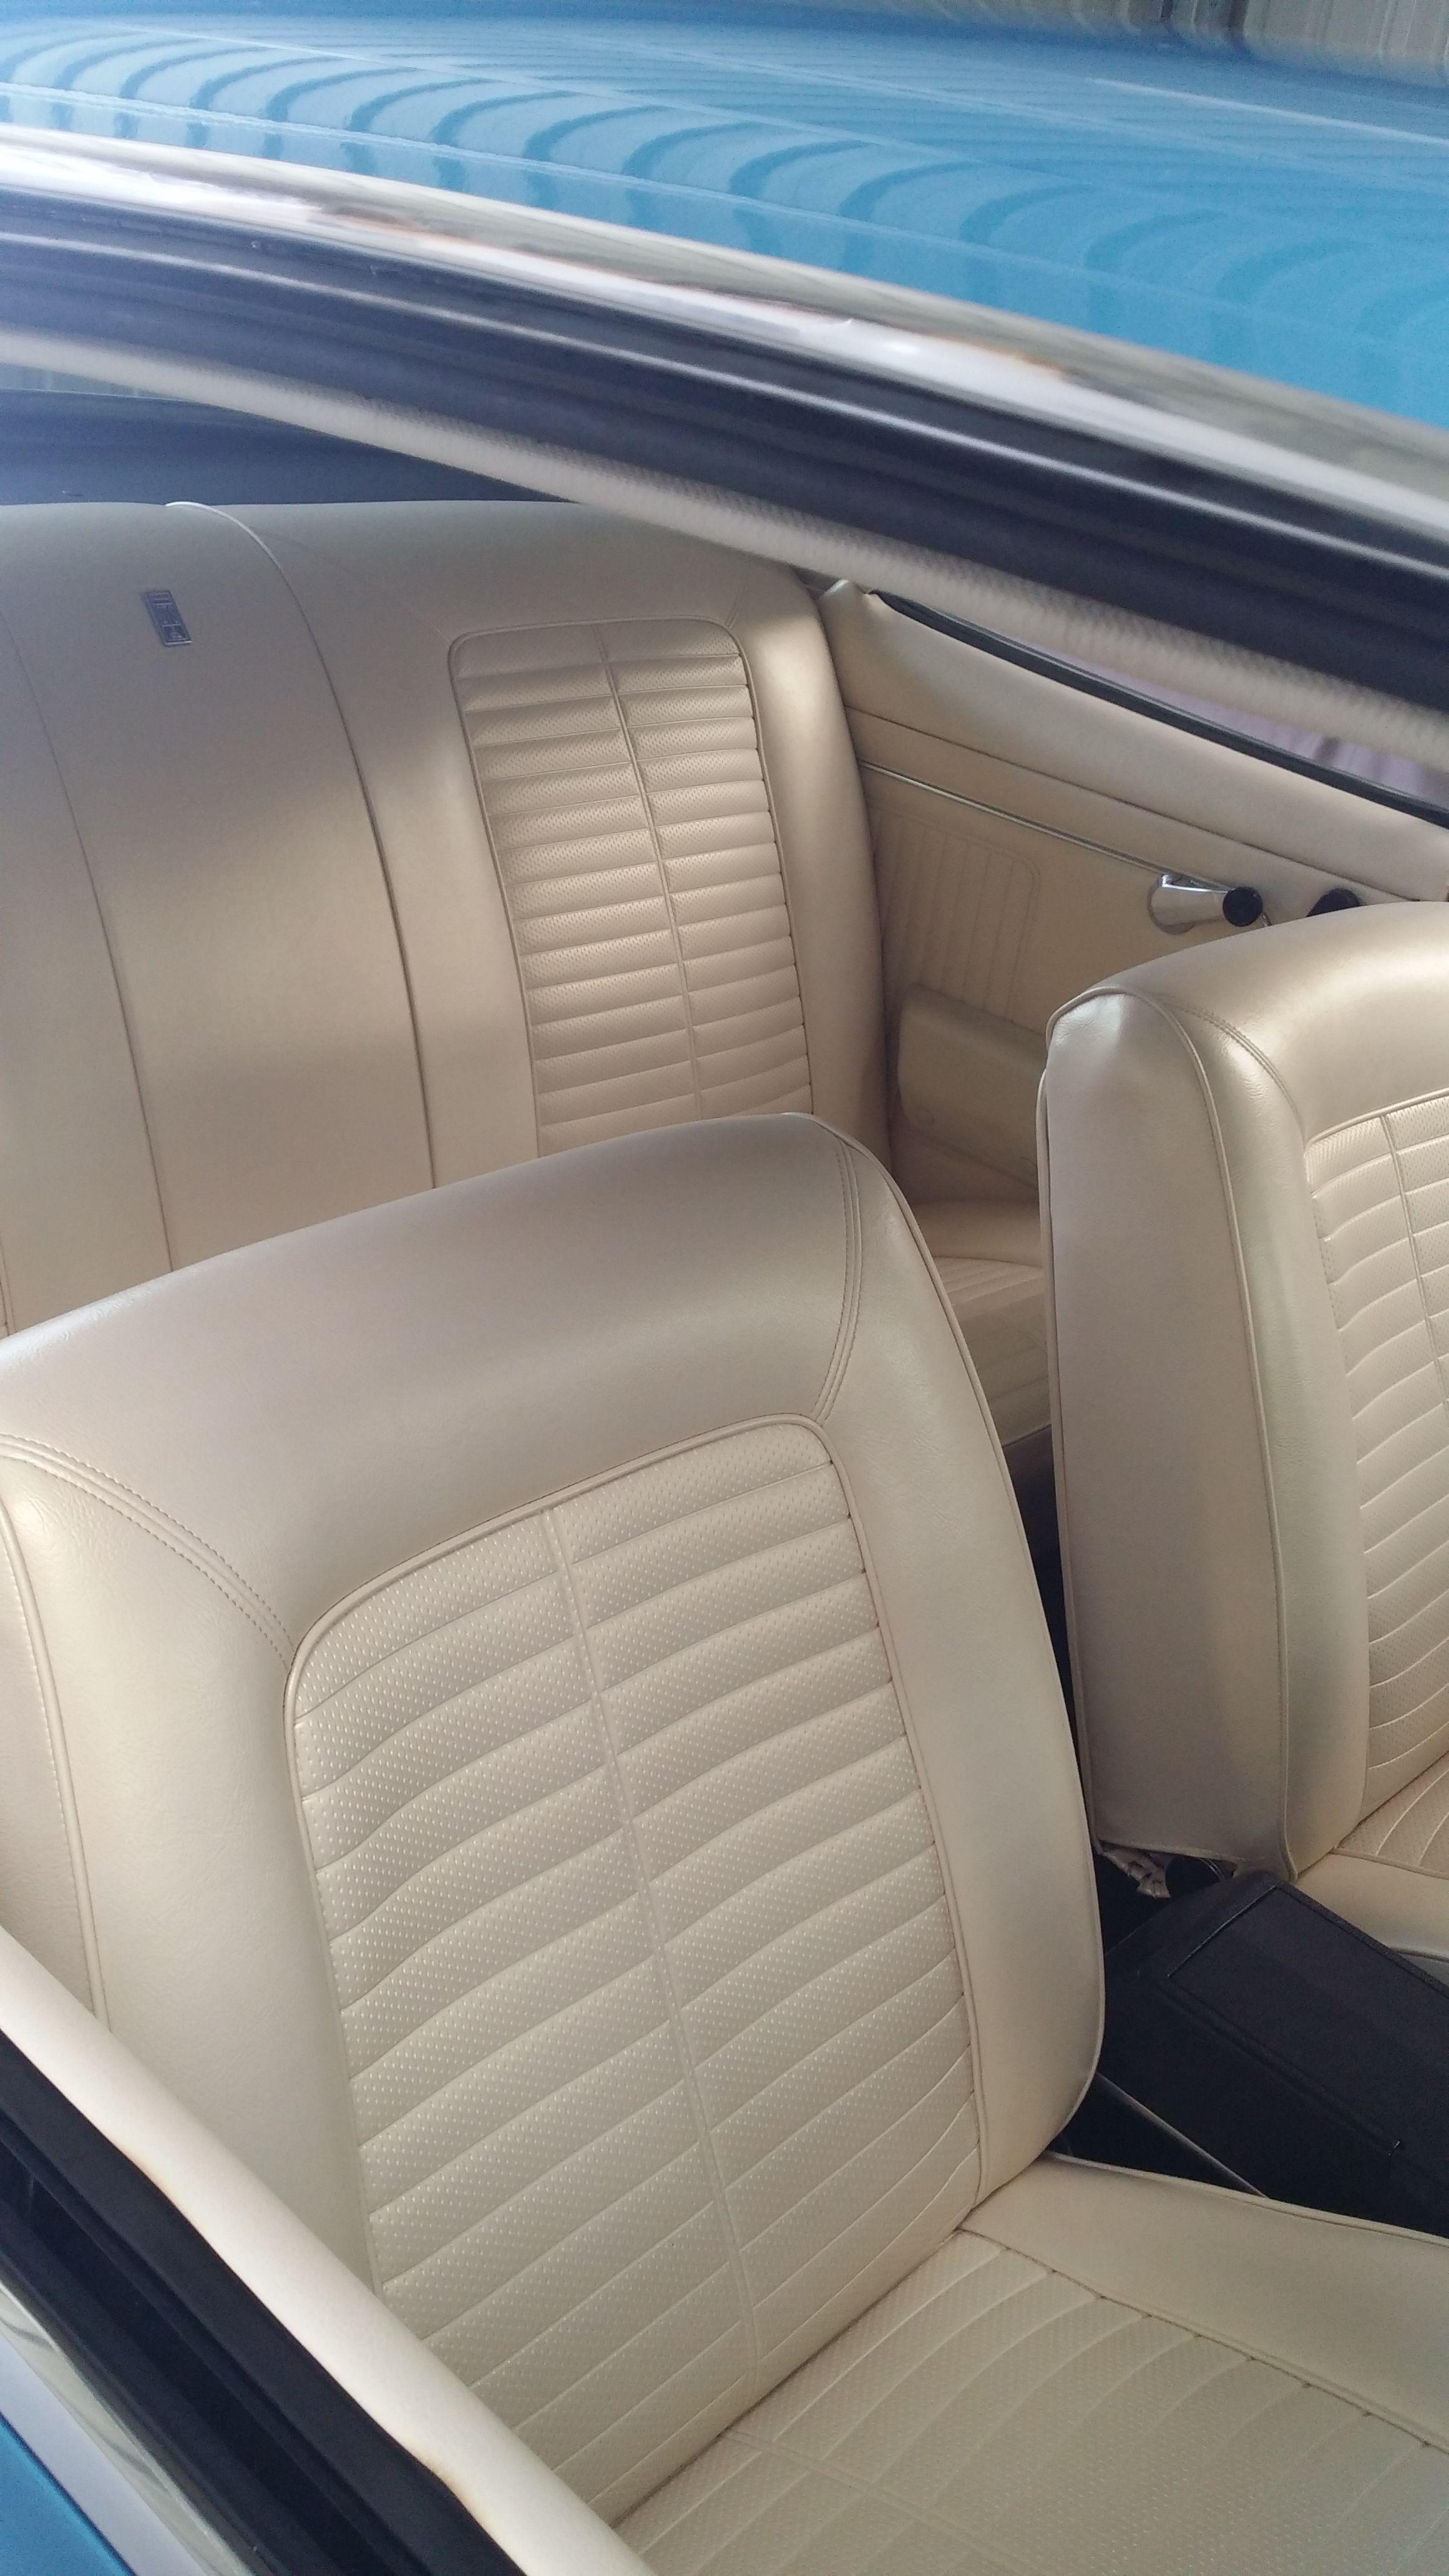 Holden HK Bathurst 327 interior trim | Leather work